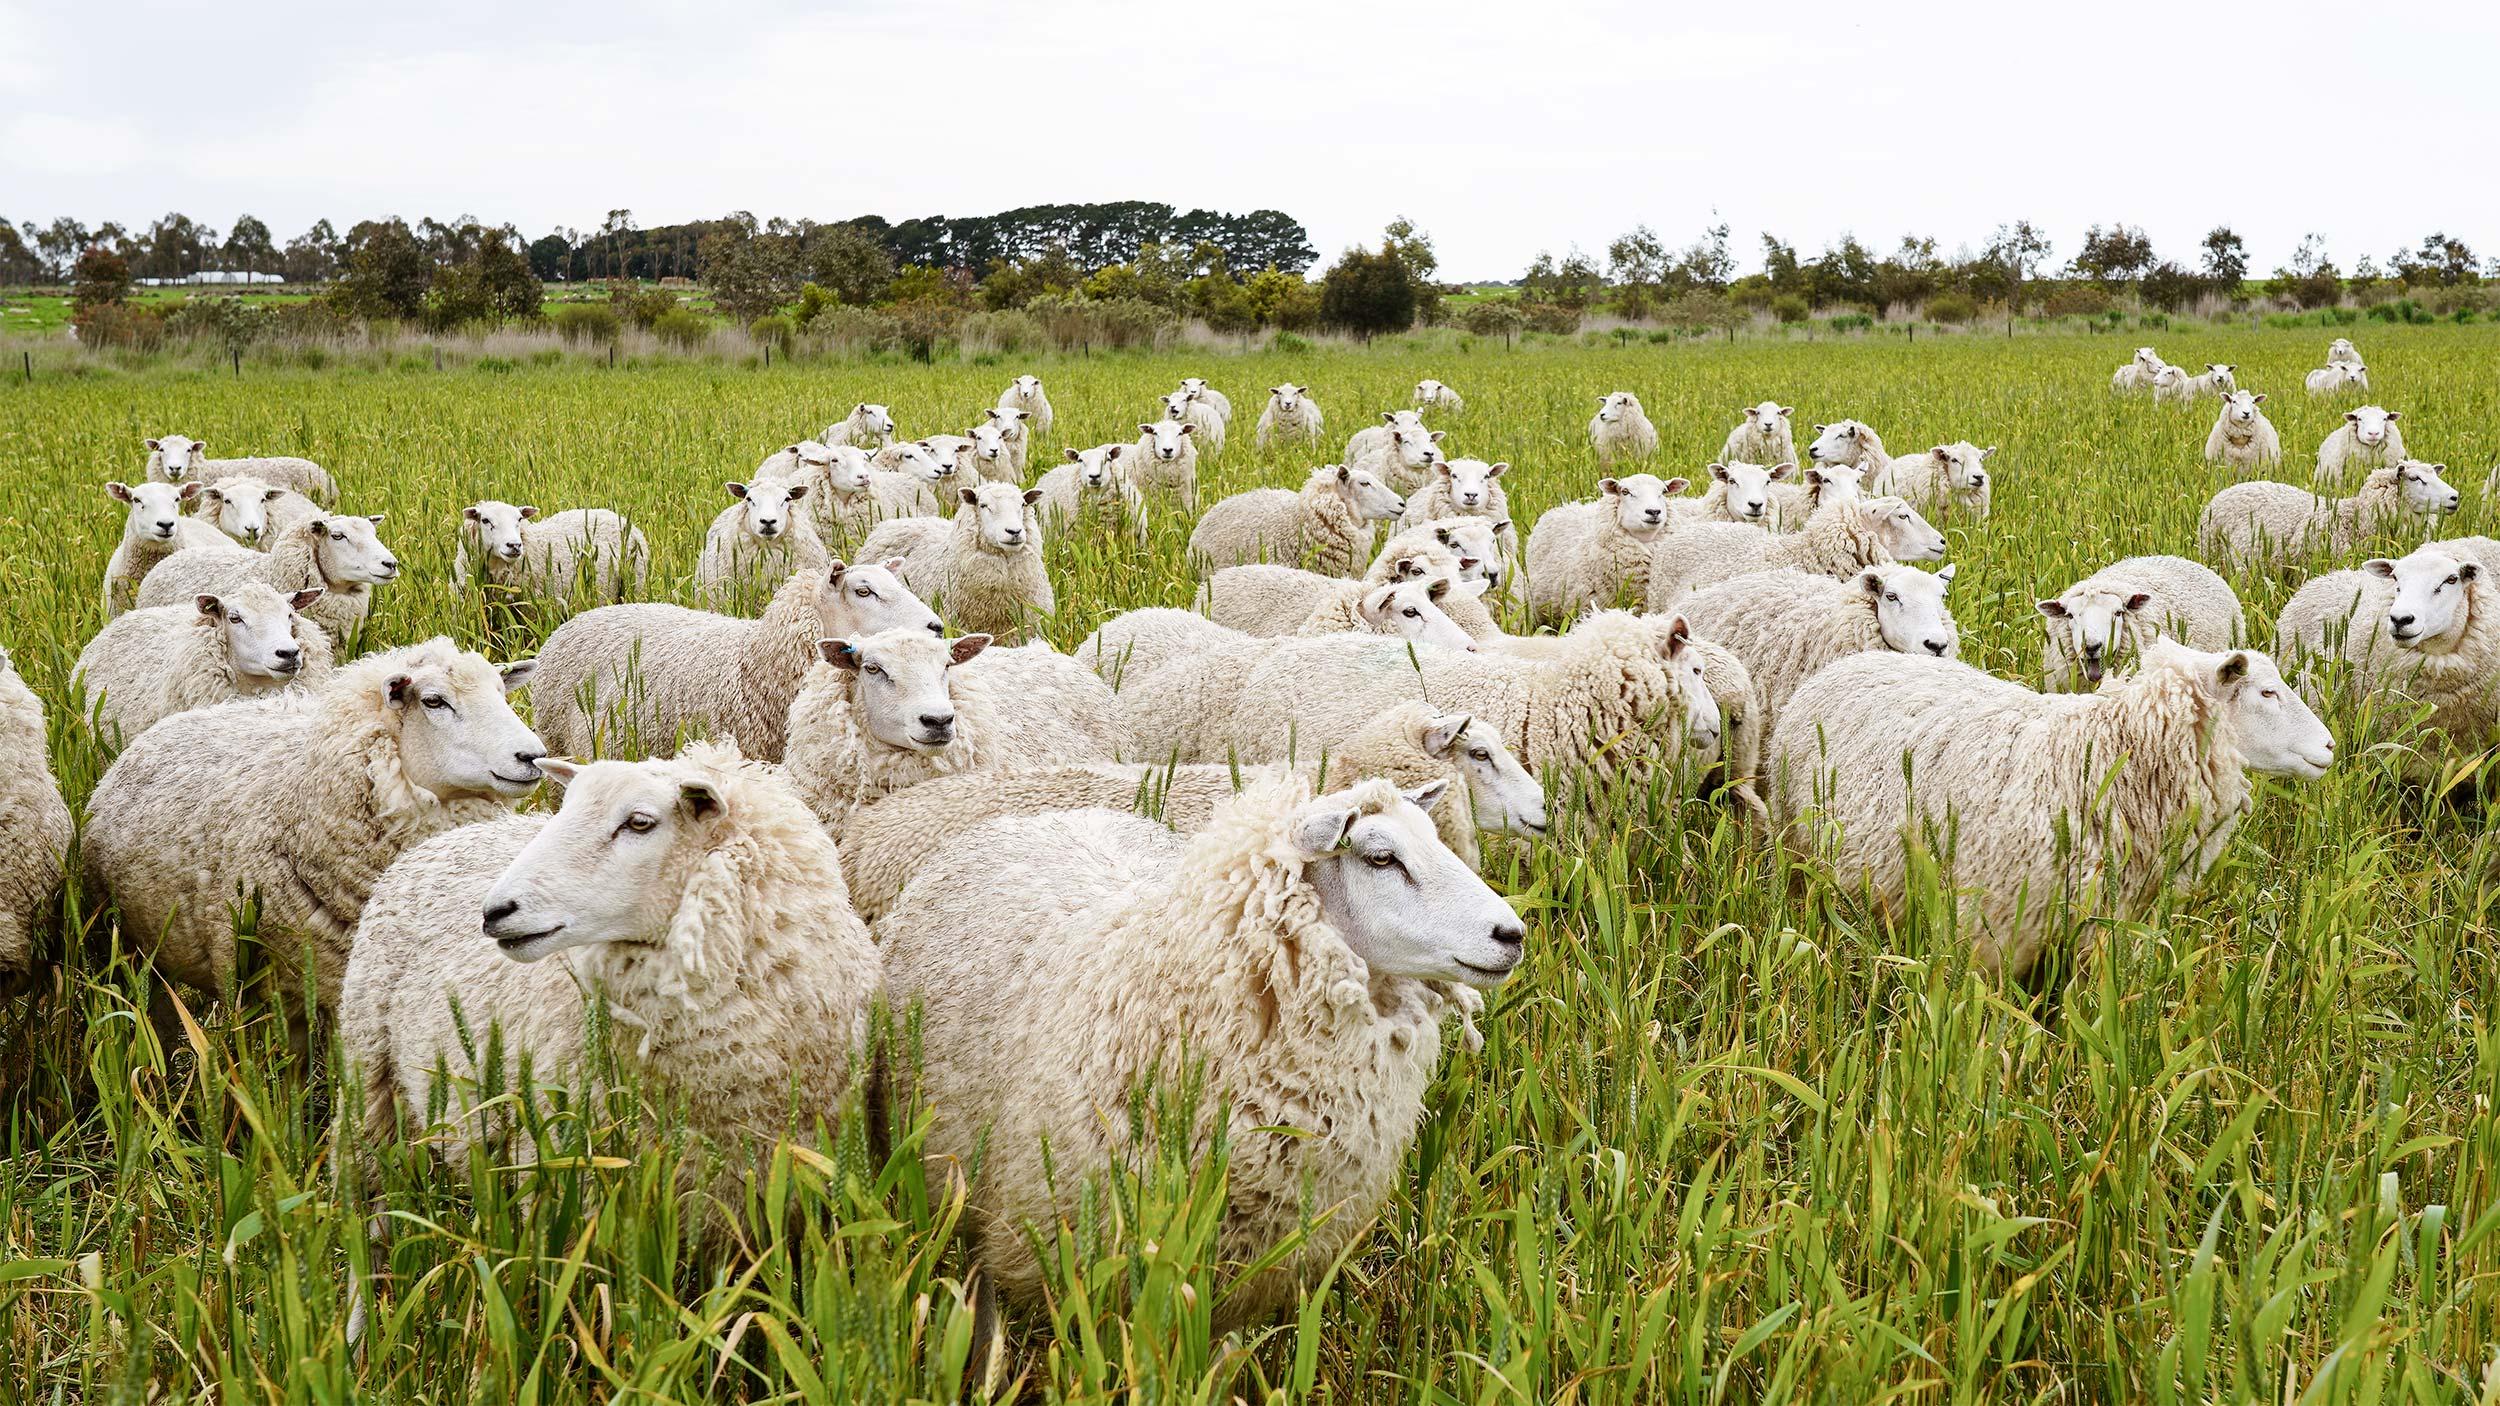 Flock of sheep grazing in a green field